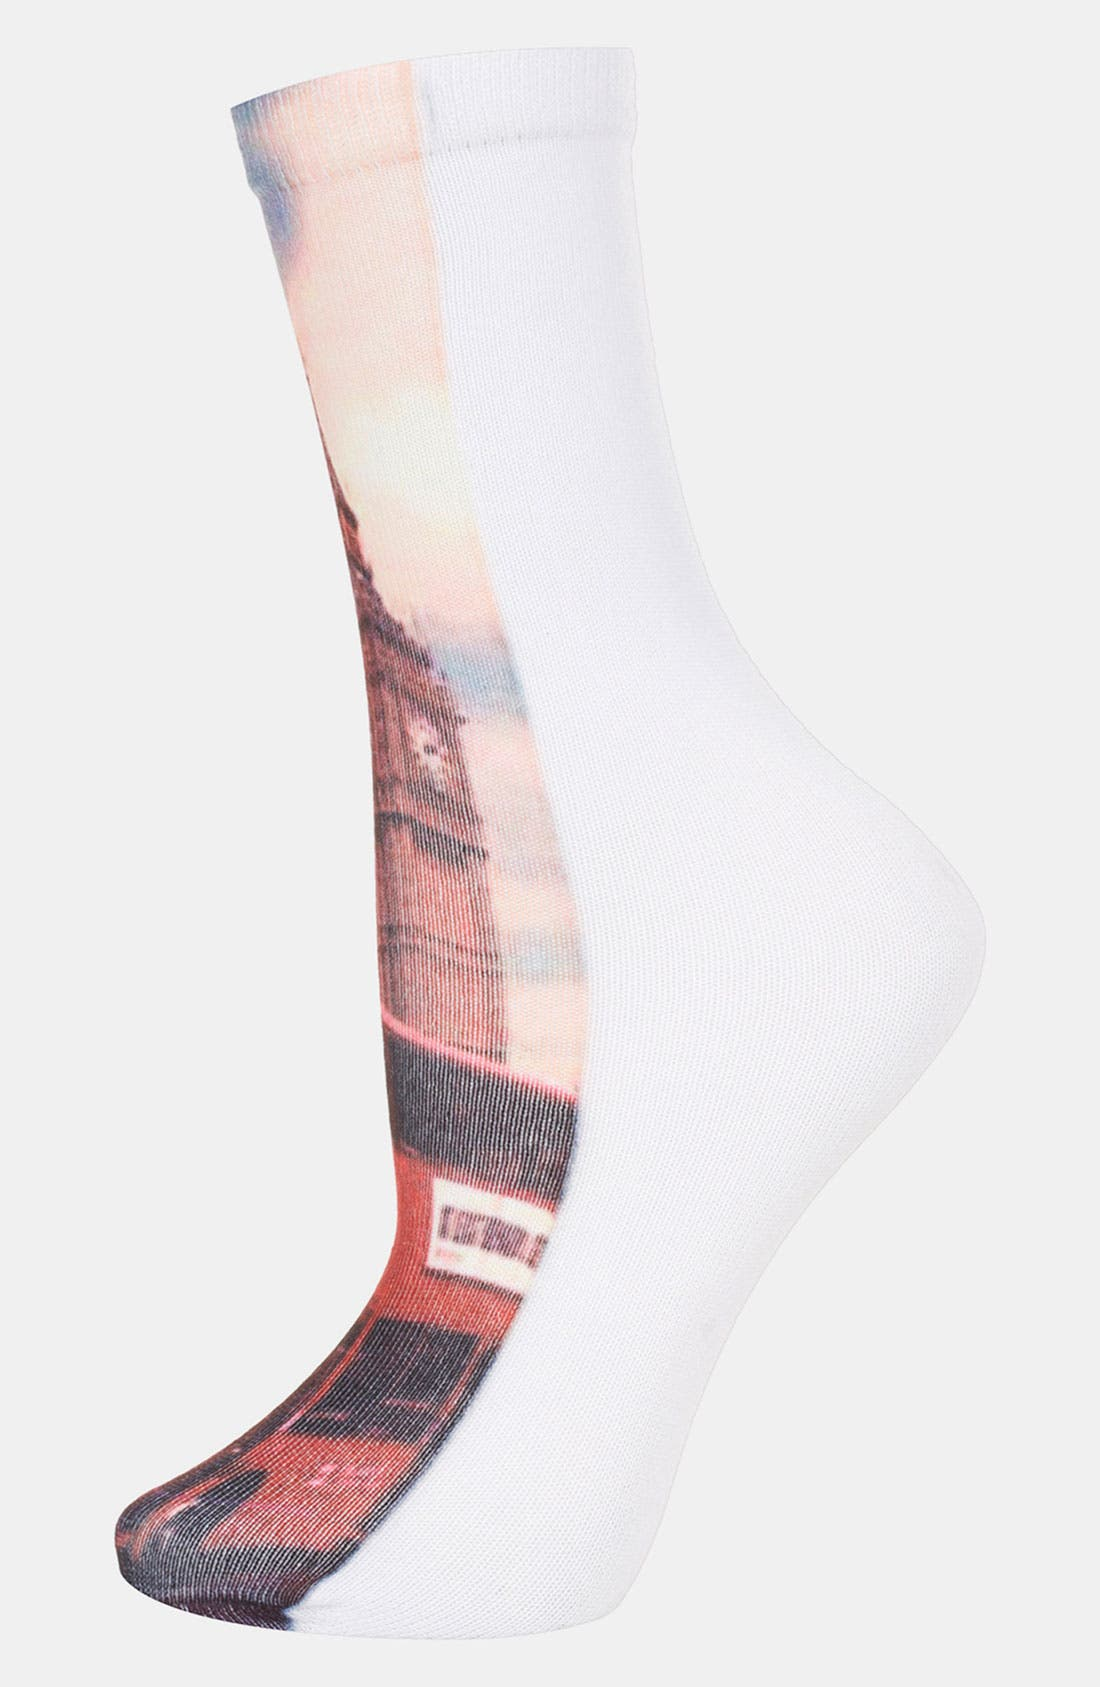 Alternate Image 1 Selected - Topshop 'London Scape' Socks